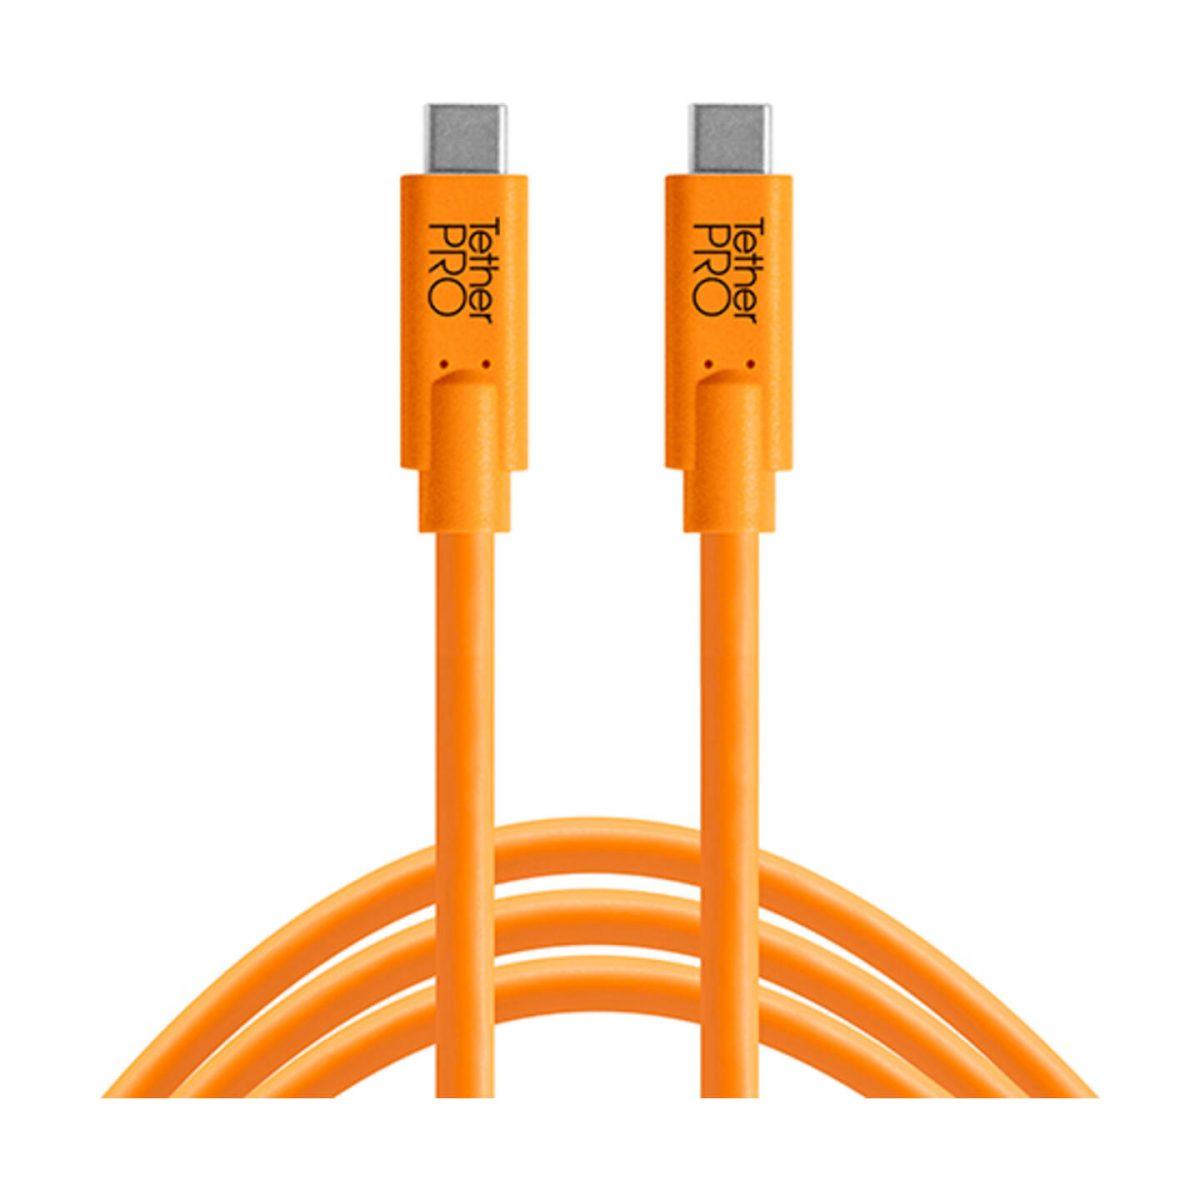 tether_tools_usbc_auf_usbc_orange_01